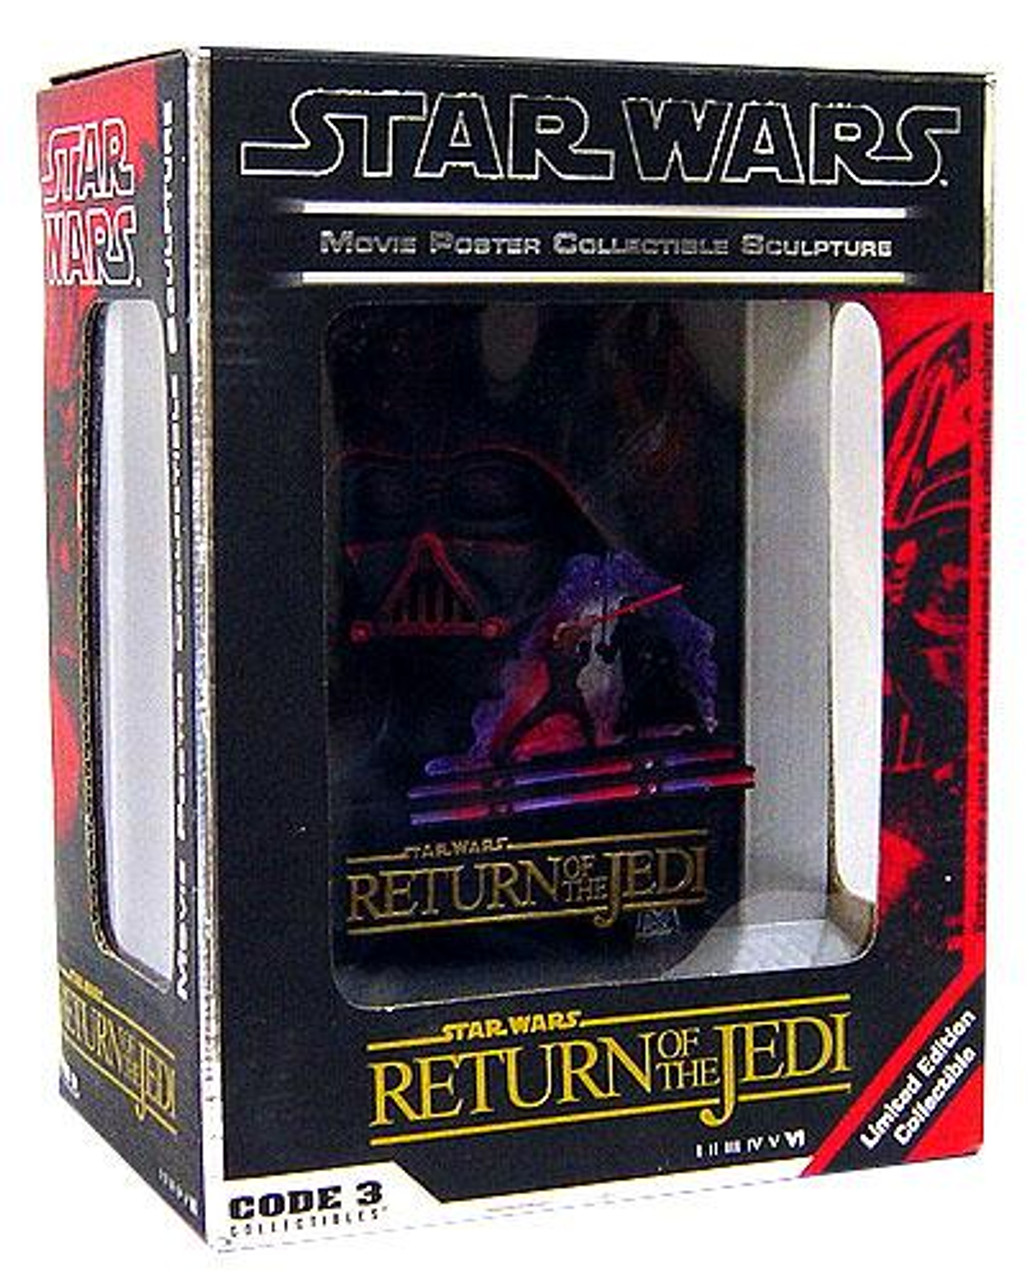 Star Wars 3-D Movie Poster Sculptures Return of the Jedi 3-D Movie Poster Sculpture